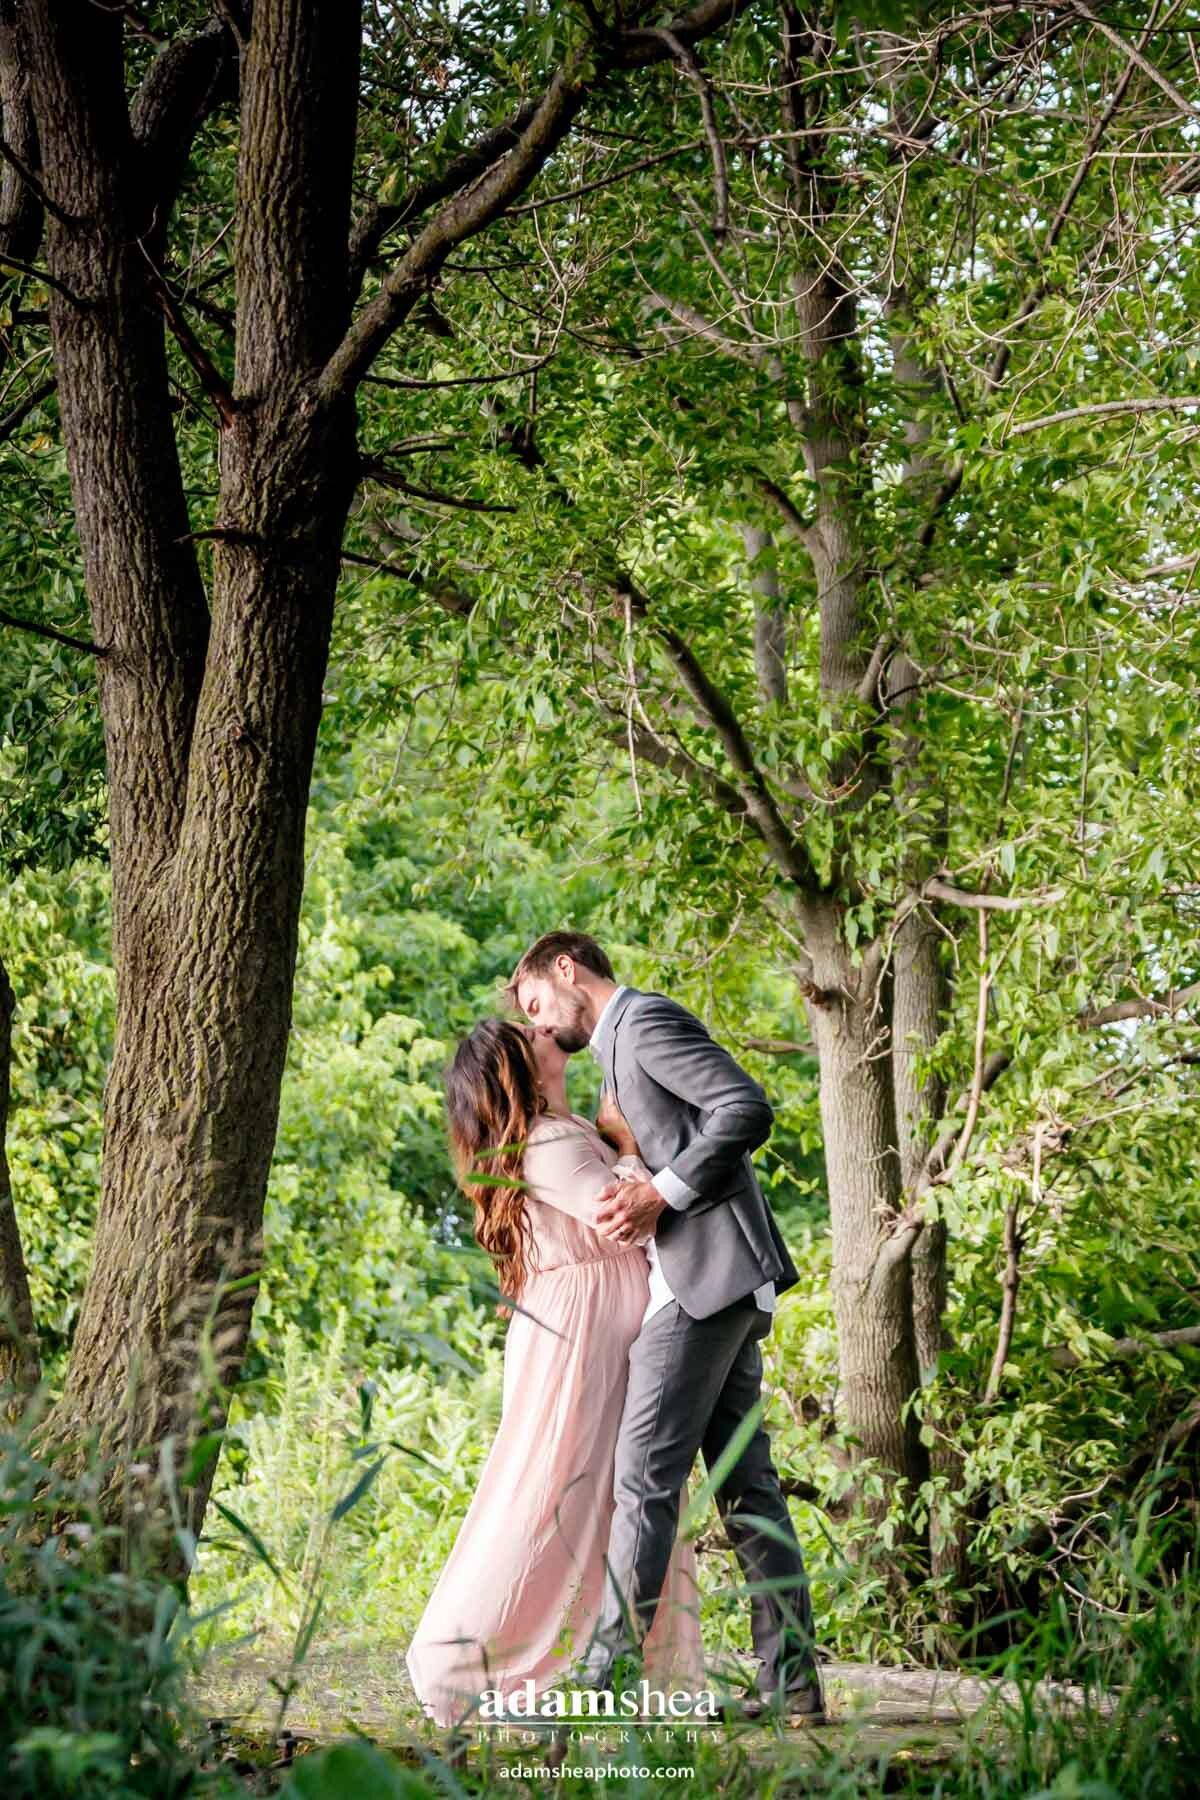 amy-adam-engagement-photos-larsen-wi-neenah-winding-trail-flowy-dress-grey-suit-adam-shea-photography-green-bay-appleton-neenah-photographer-2.jpg